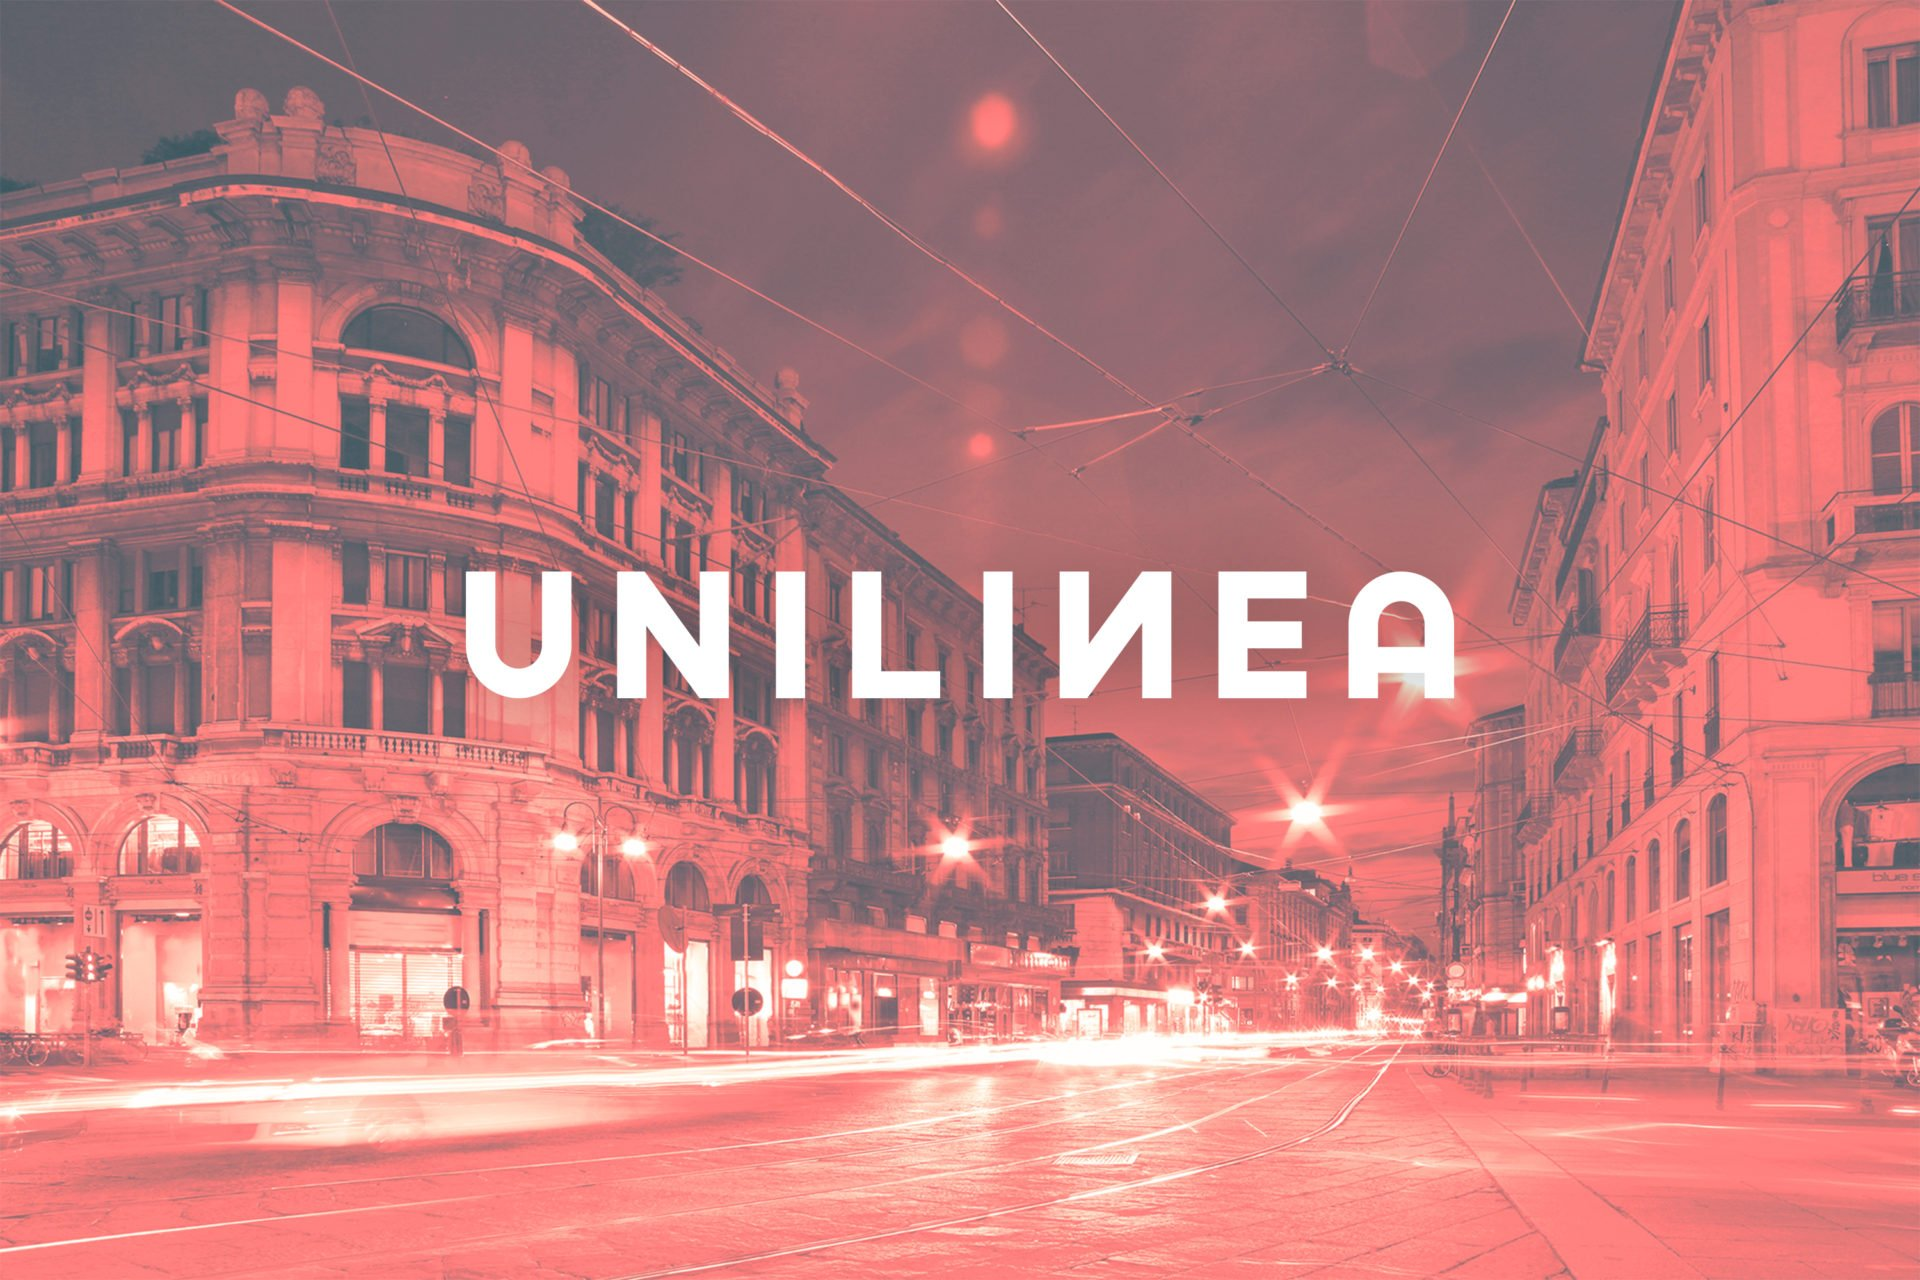 UNILINEA